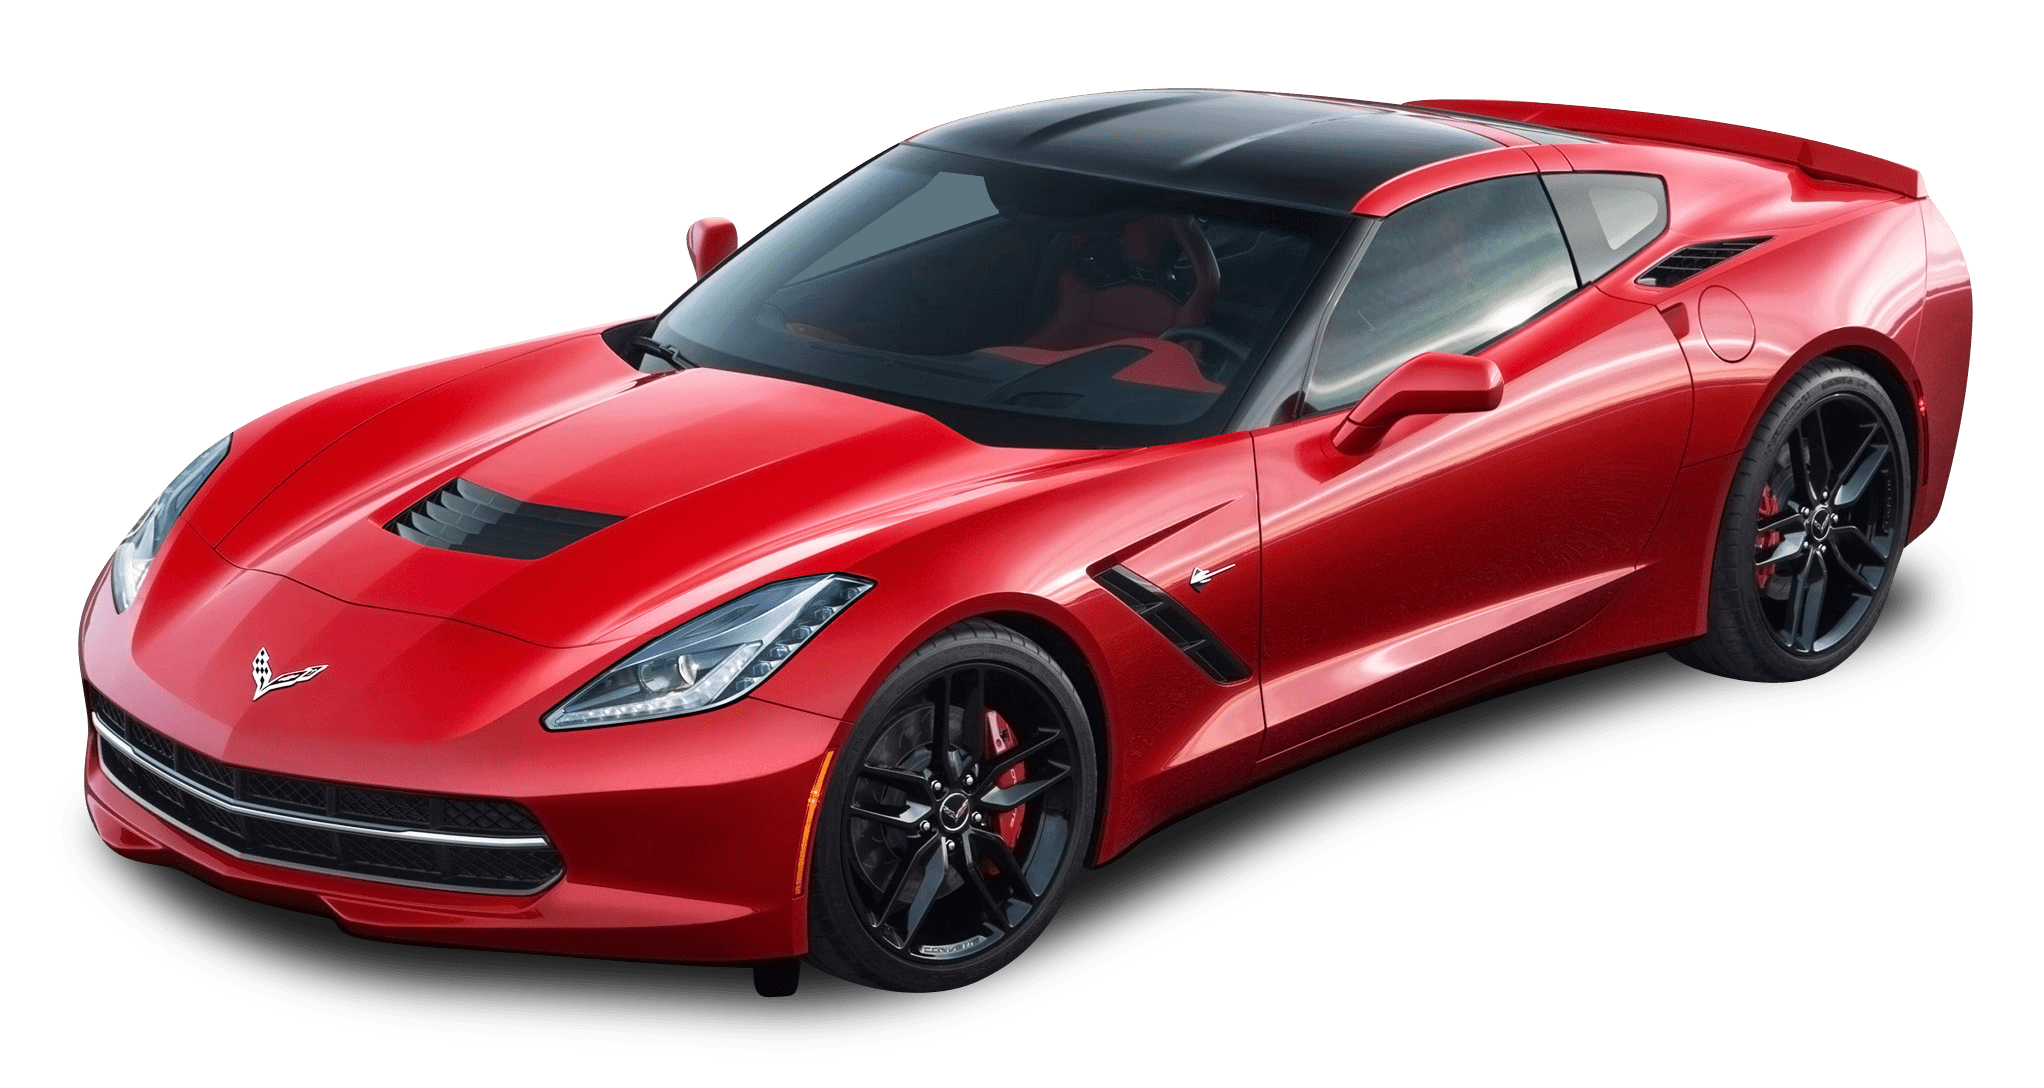 Red Corvette transparent PNG.